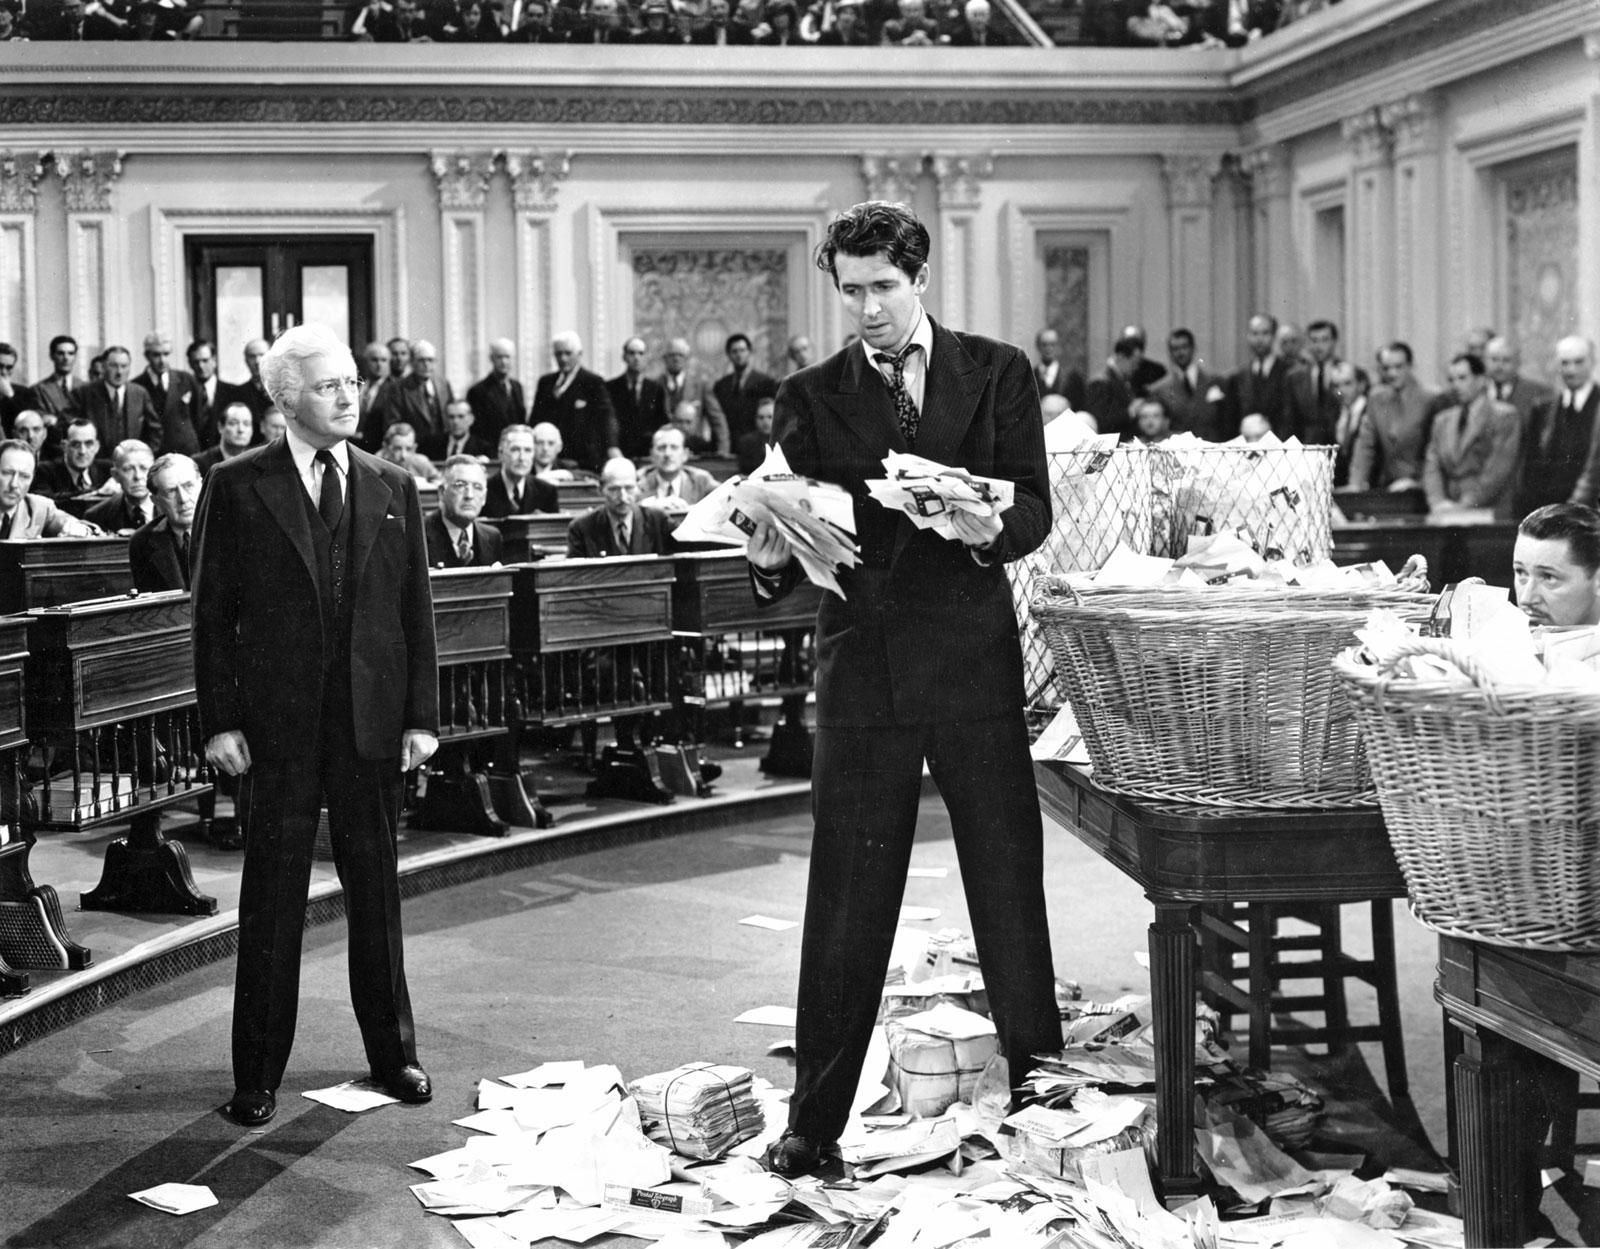 worksheet Mr Smith Goes To Washington Worksheet senate filibuster rule frustrates divided house republicans st louis public radio